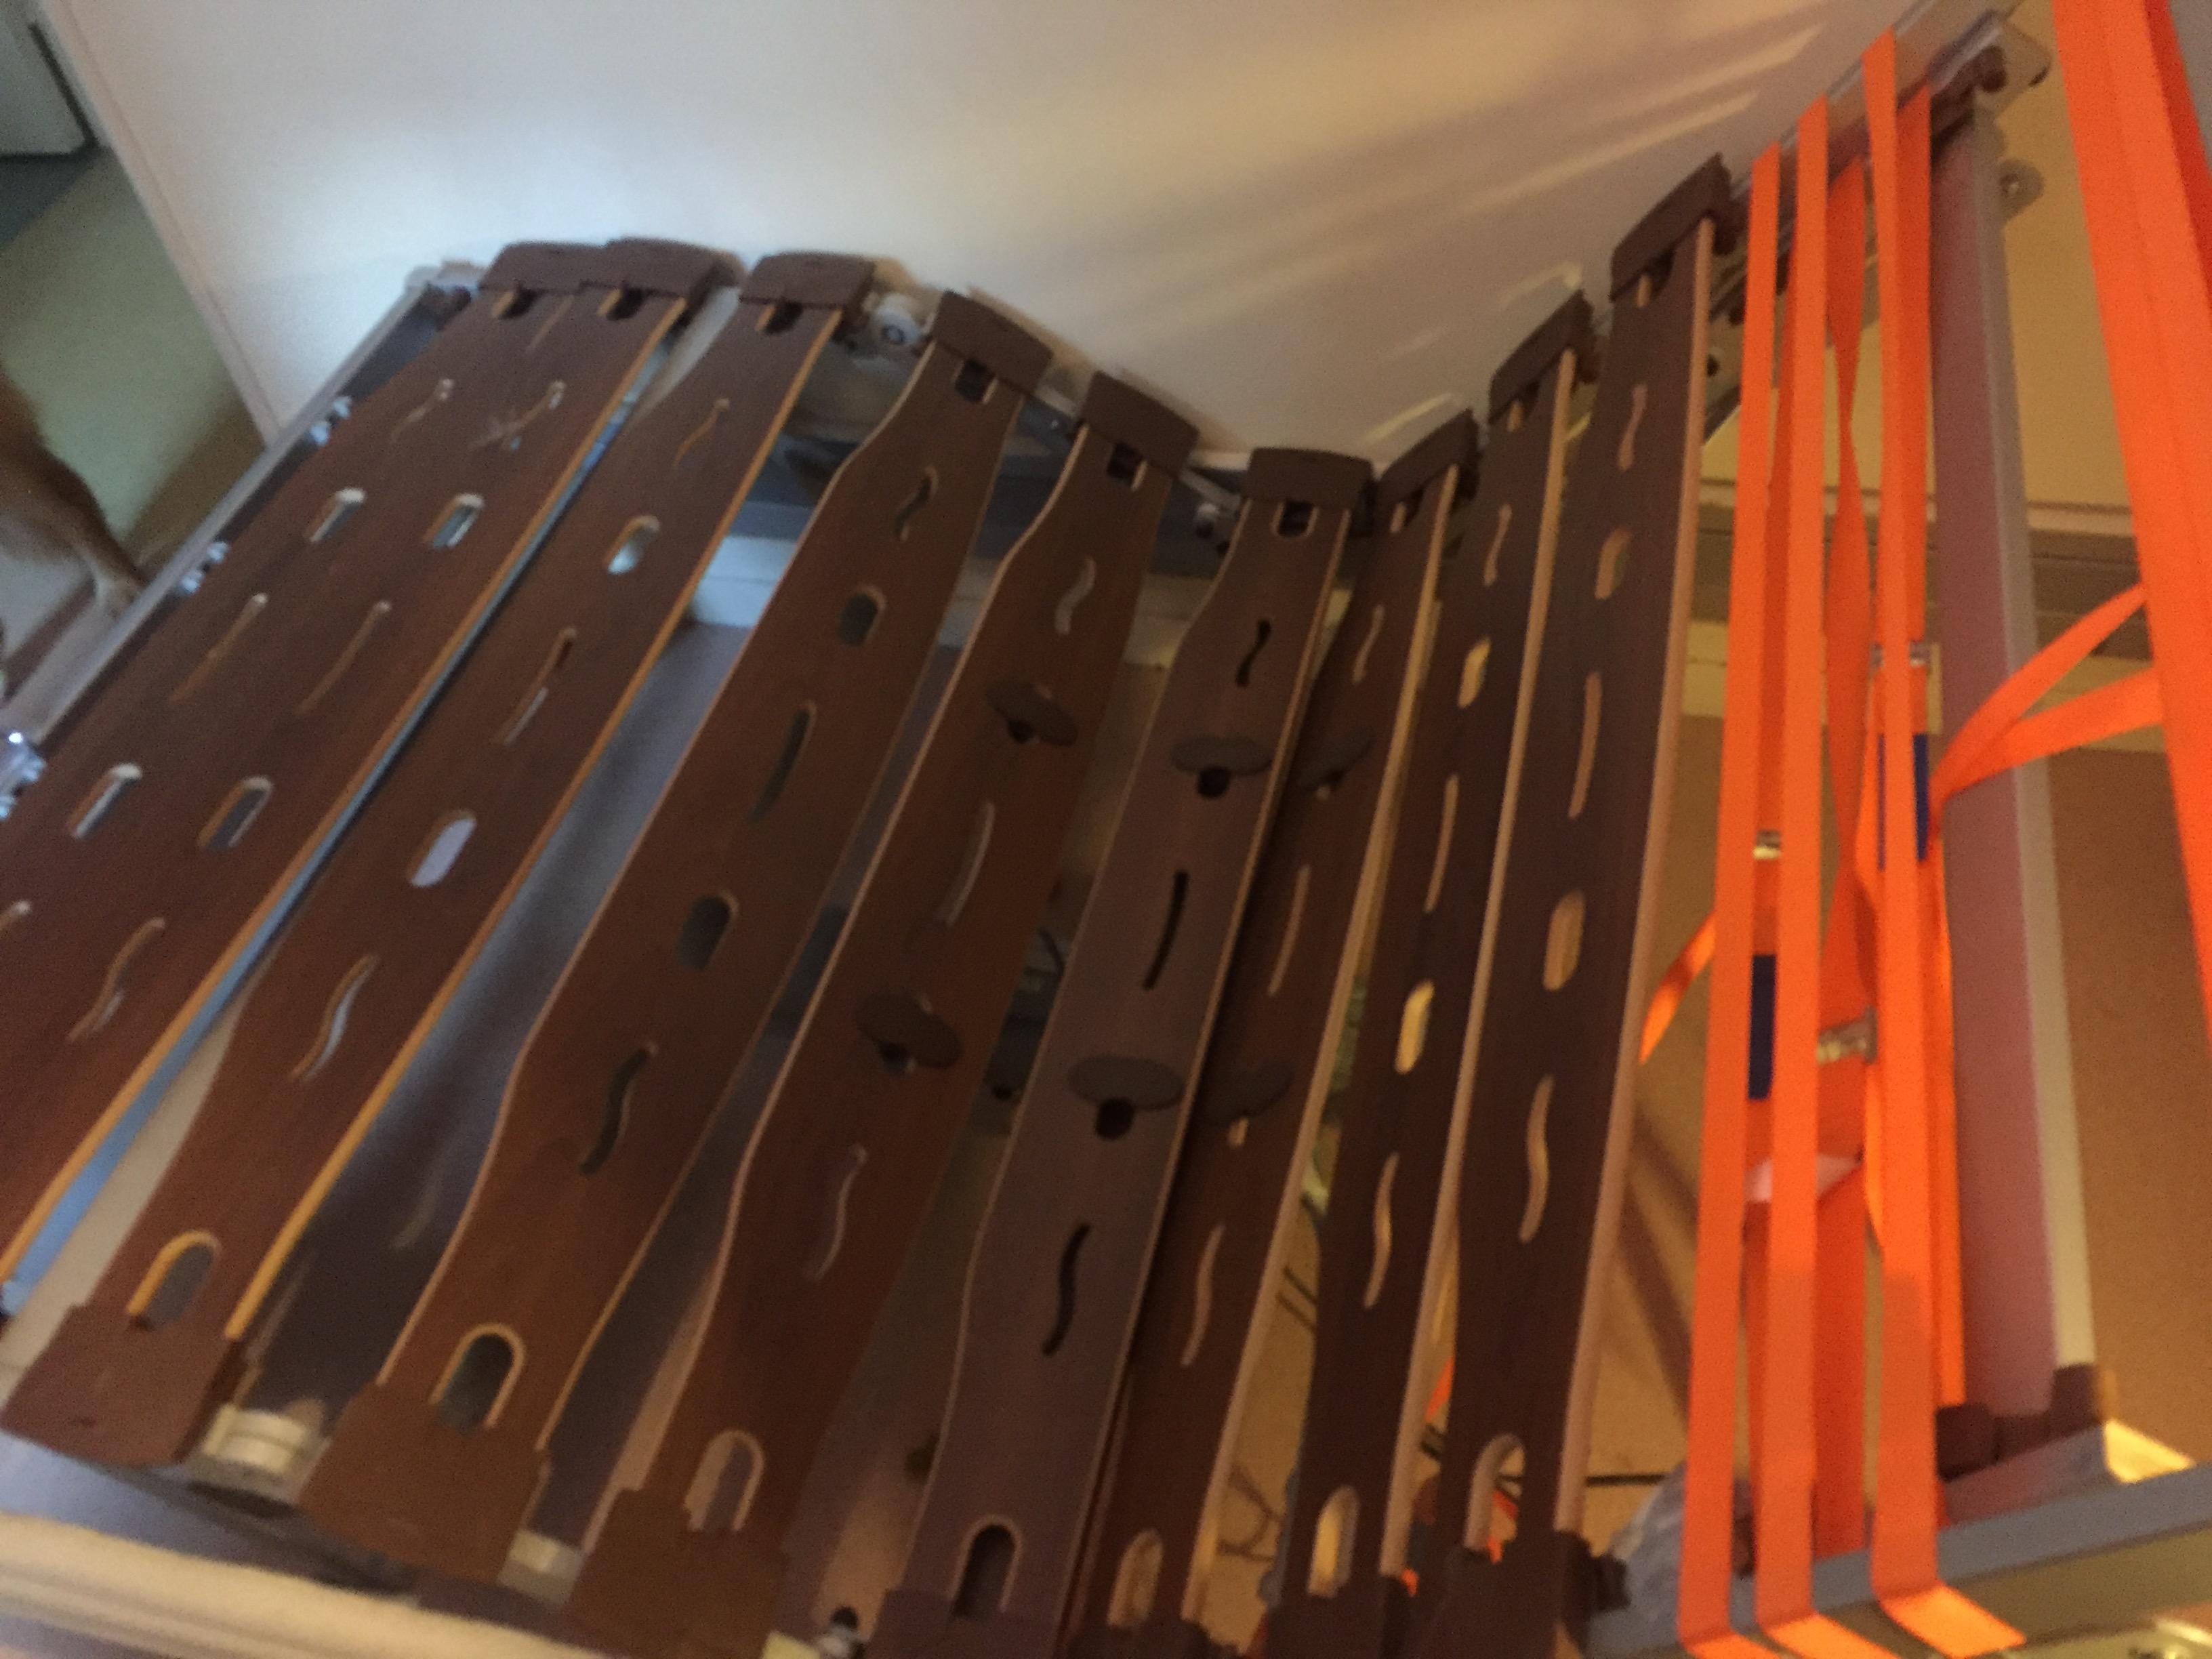 dons objets gratuits lit lectrique andr renault matelas. Black Bedroom Furniture Sets. Home Design Ideas